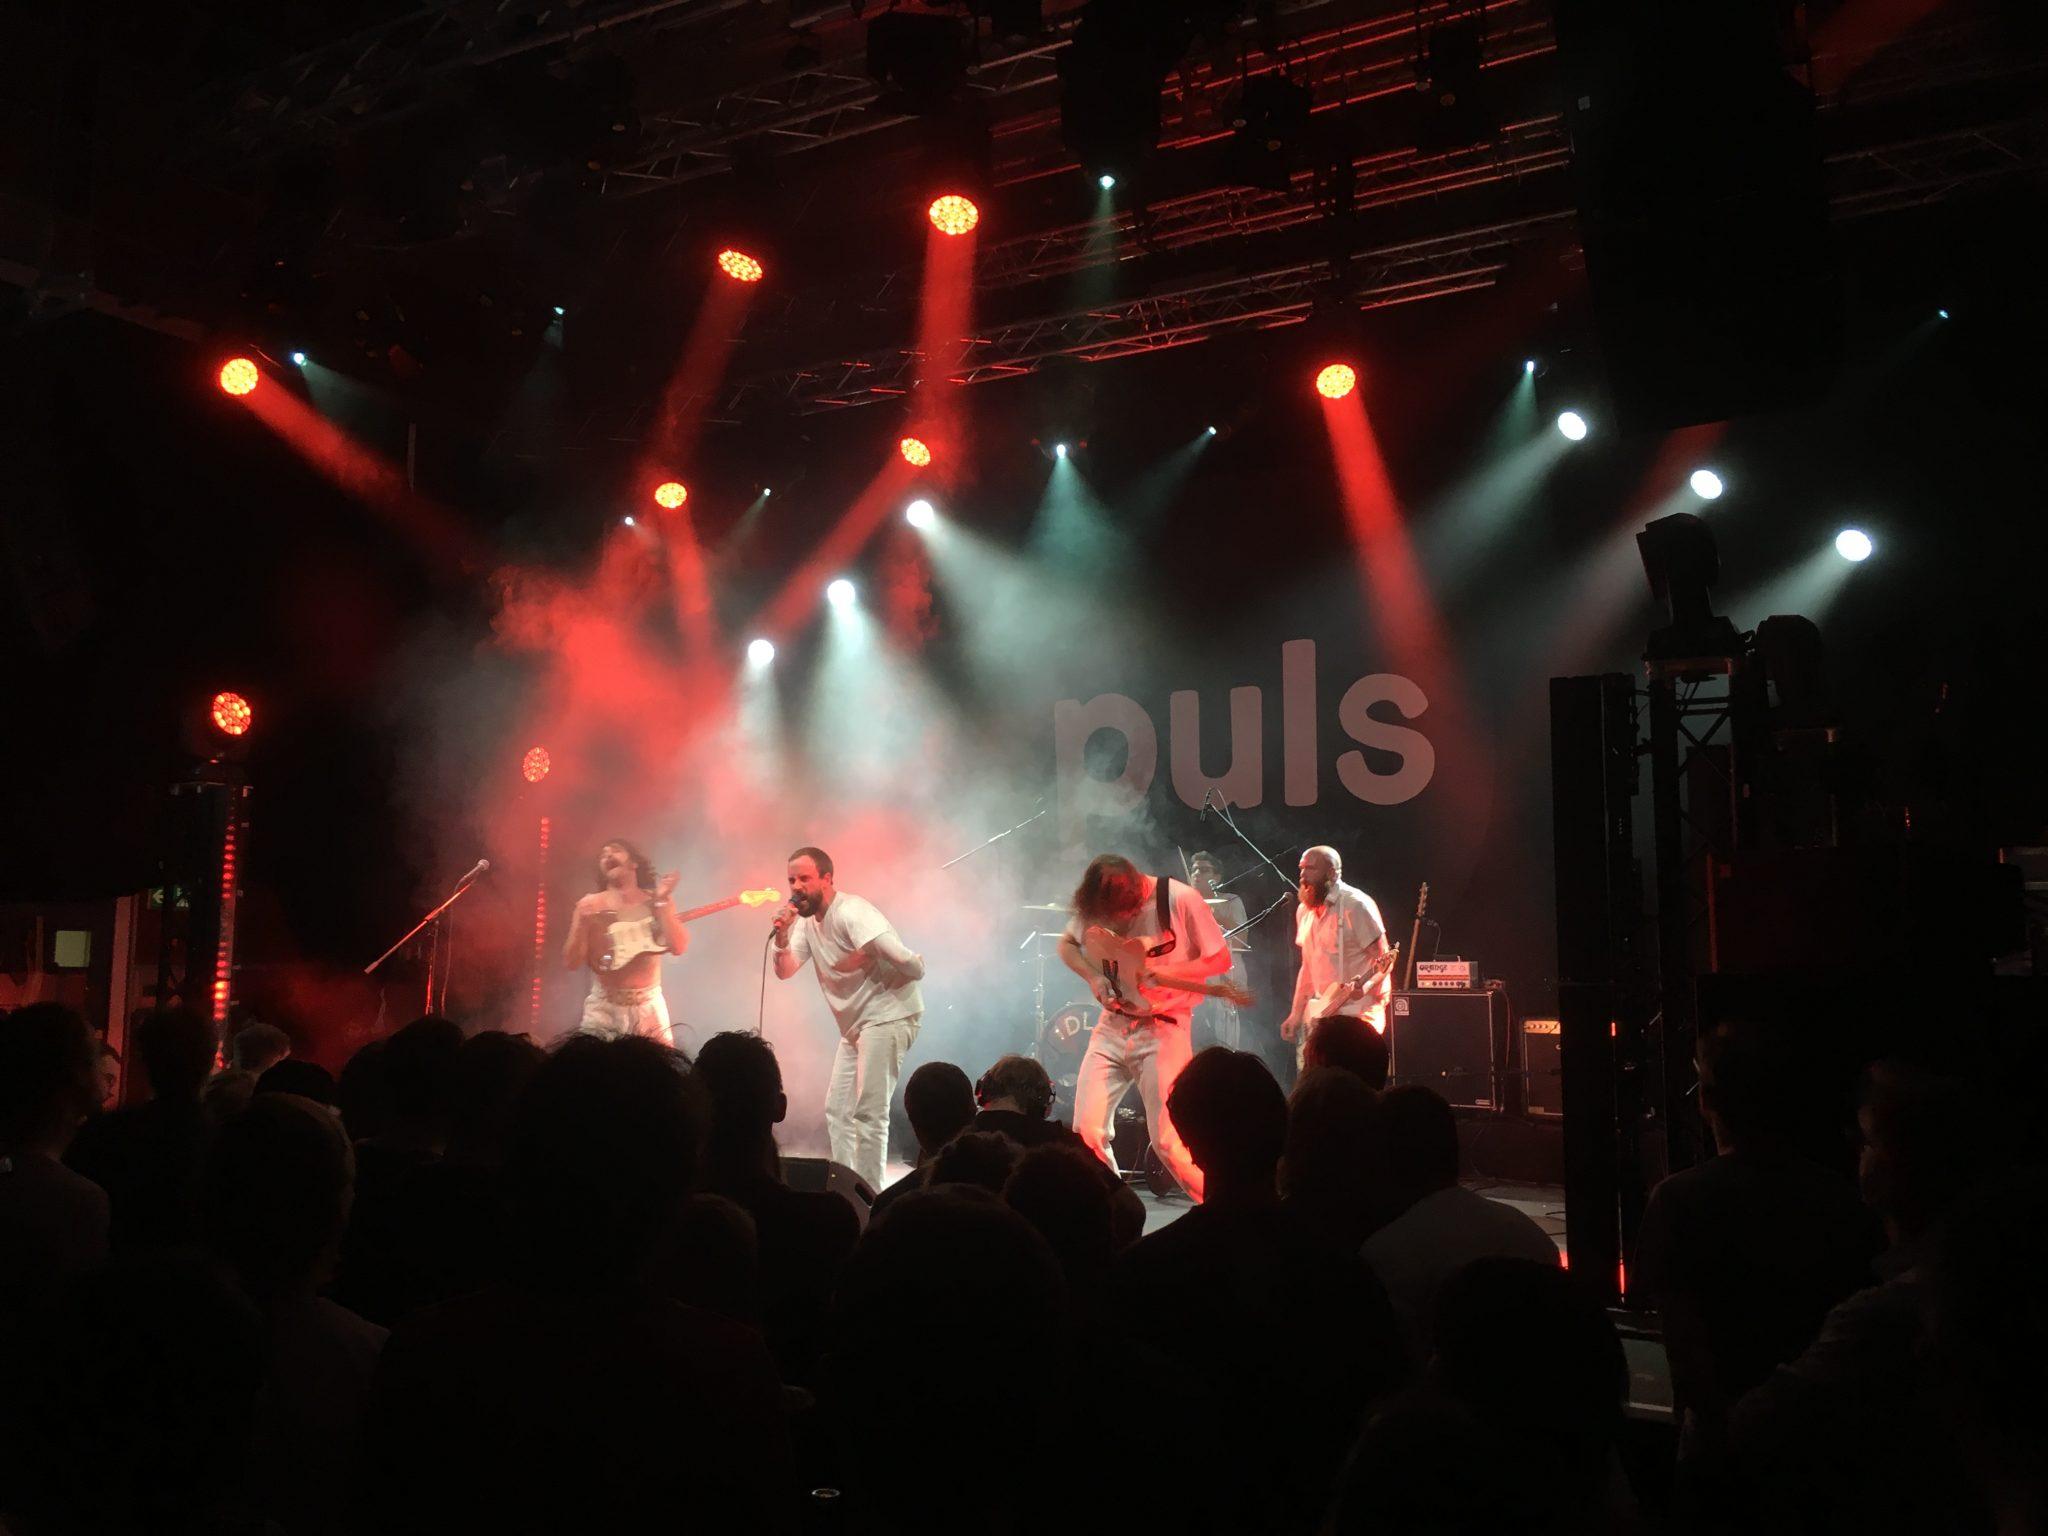 Idles_Puls_Mucbook